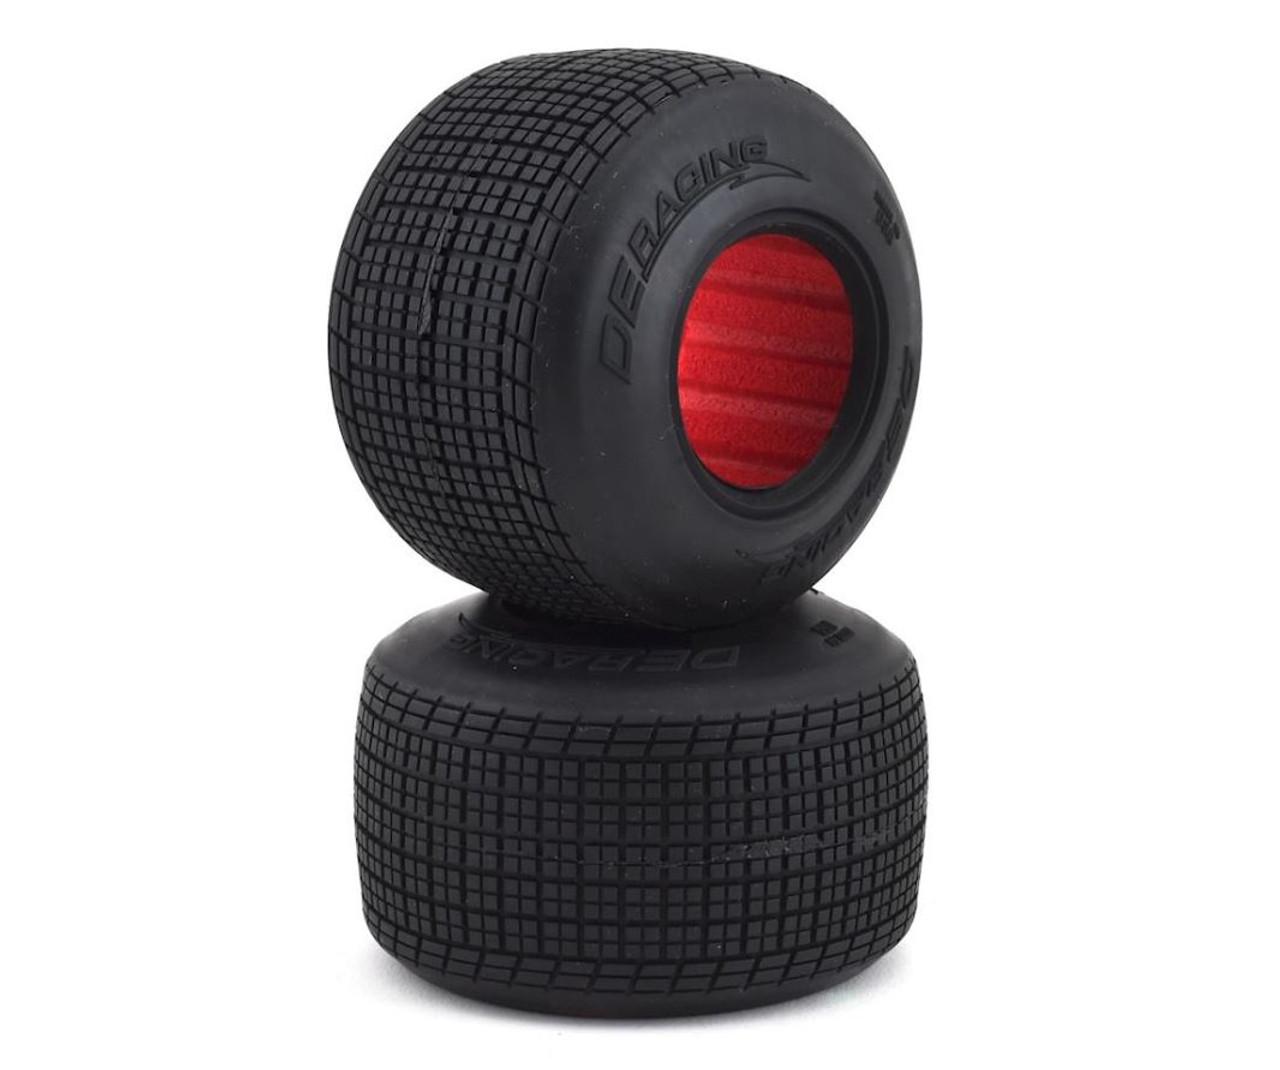 DE Racing DER-OSR2-C1 Outlaw Sprint HB Dirt Oval Rear Tires w/Red Insert (2) (Clay)